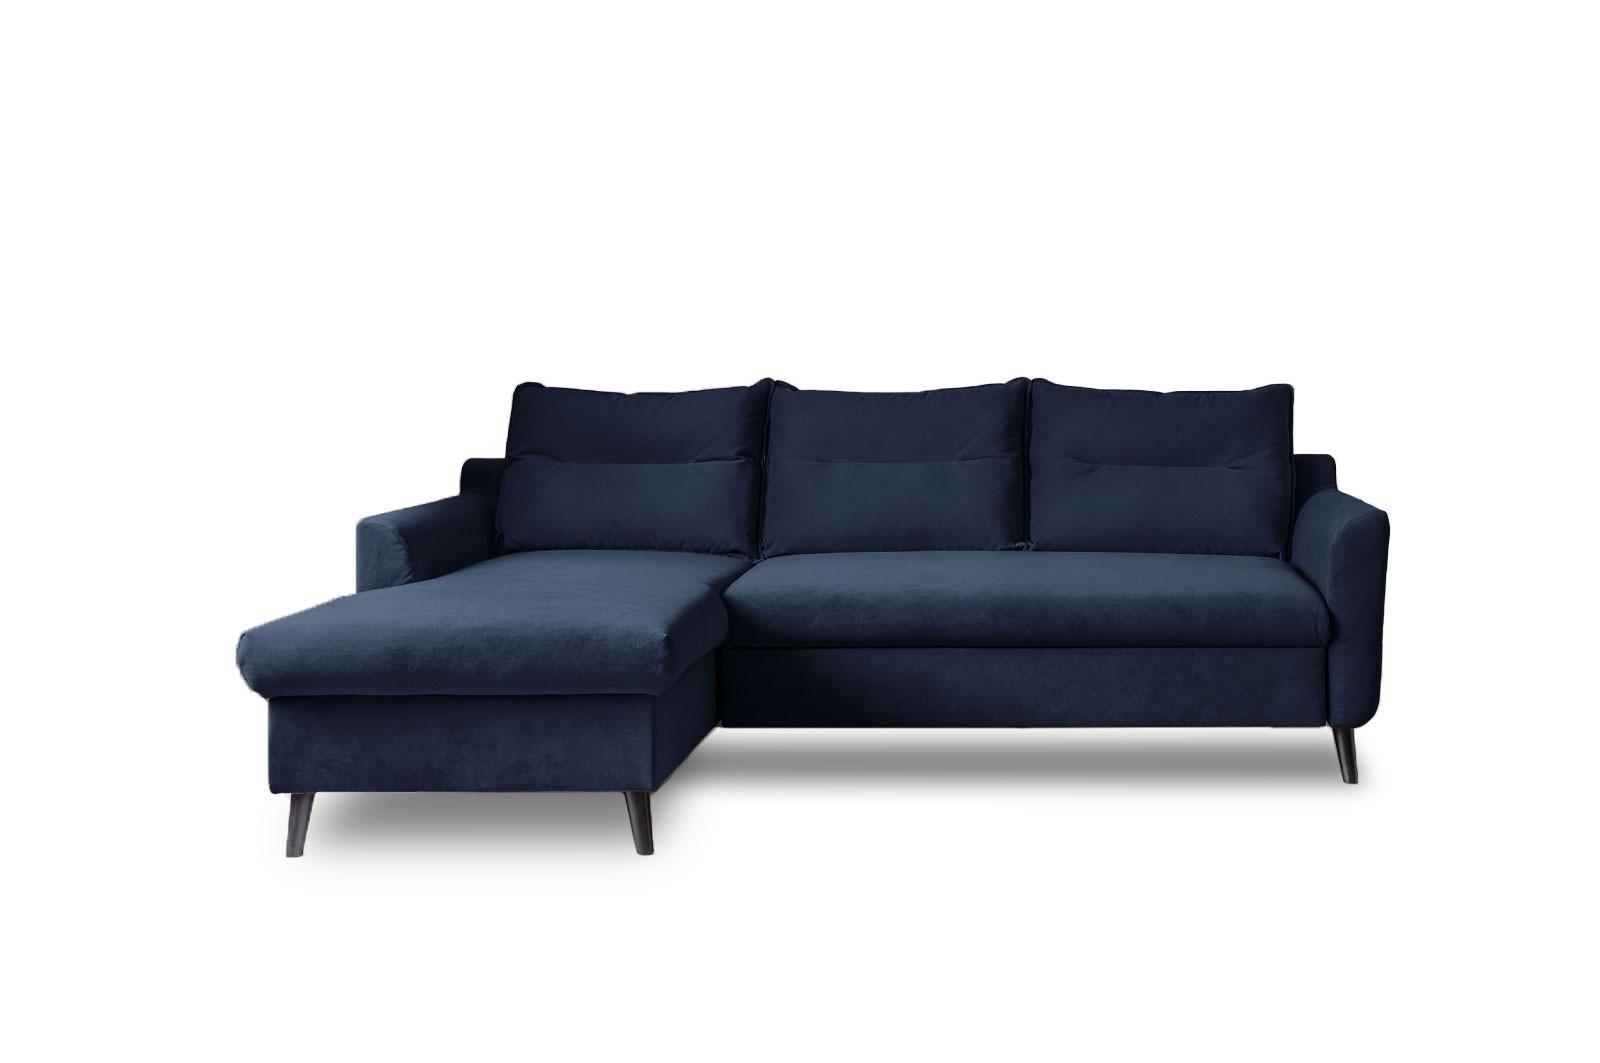 Canapé d'angle gauche convertible 4 places Tissu Bleu marine